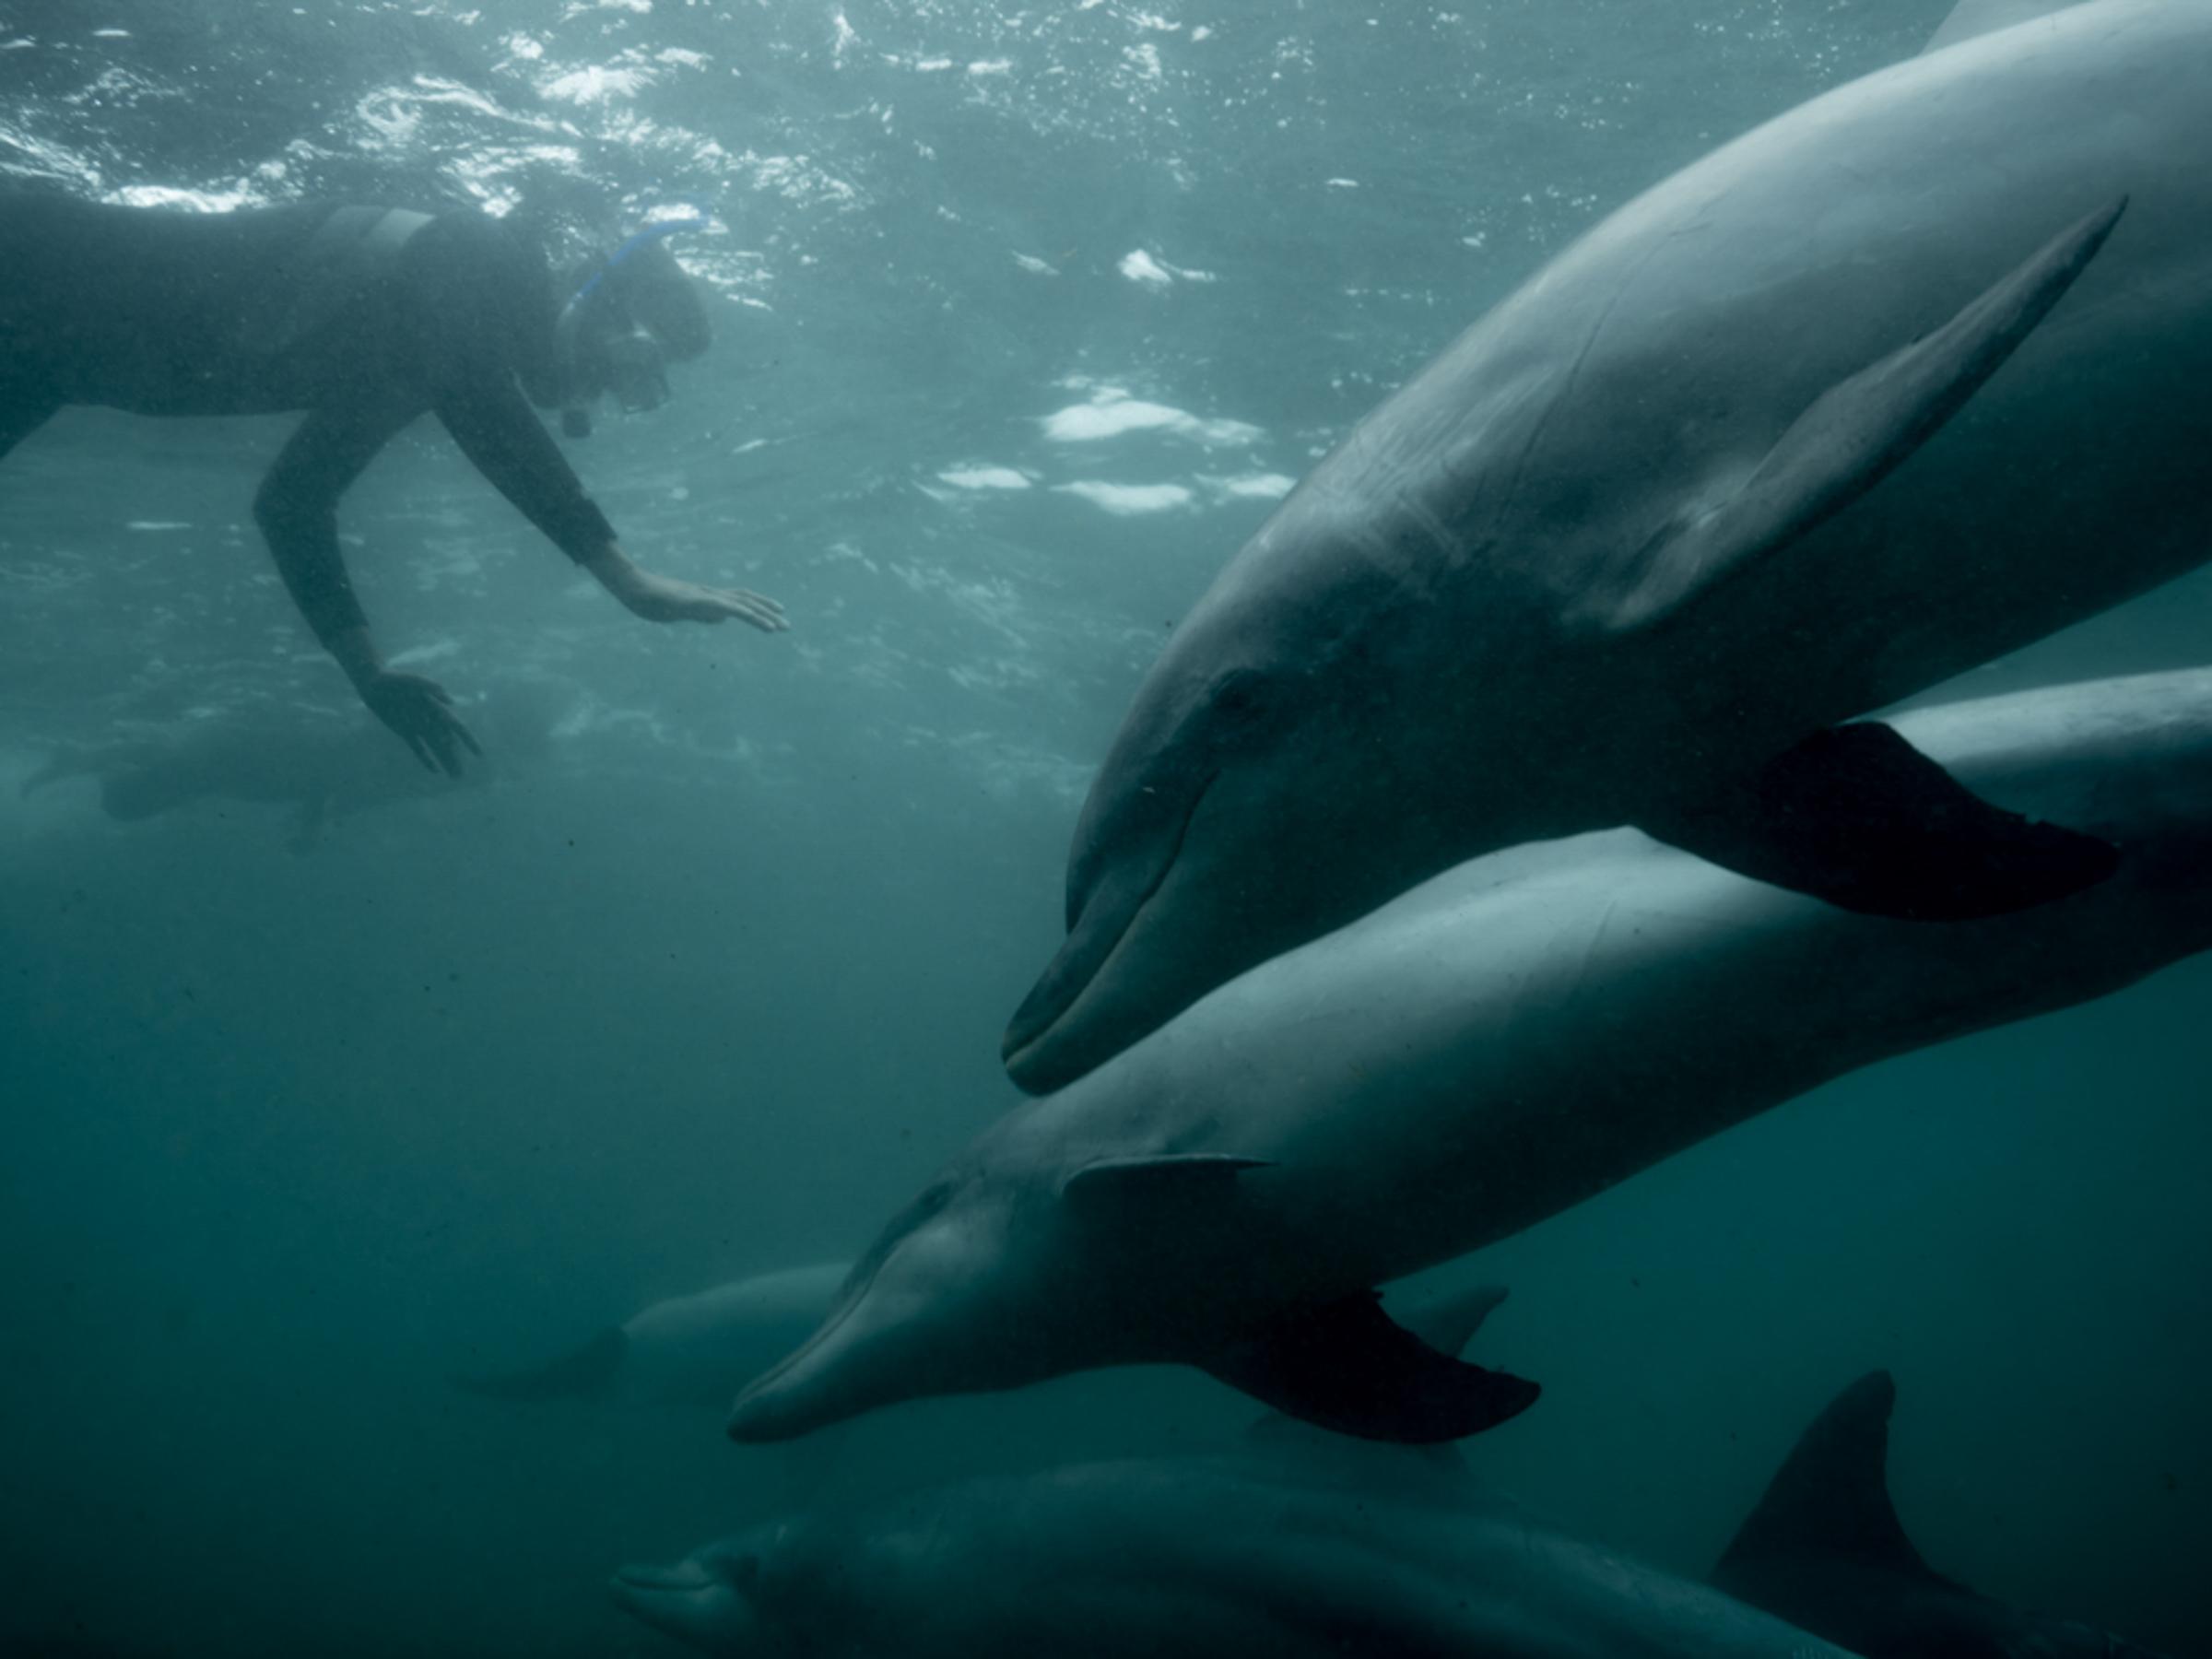 Baird Bay Ocean Eco experience - swimming with dolphins - Michaela Skovranova / Greenpeace